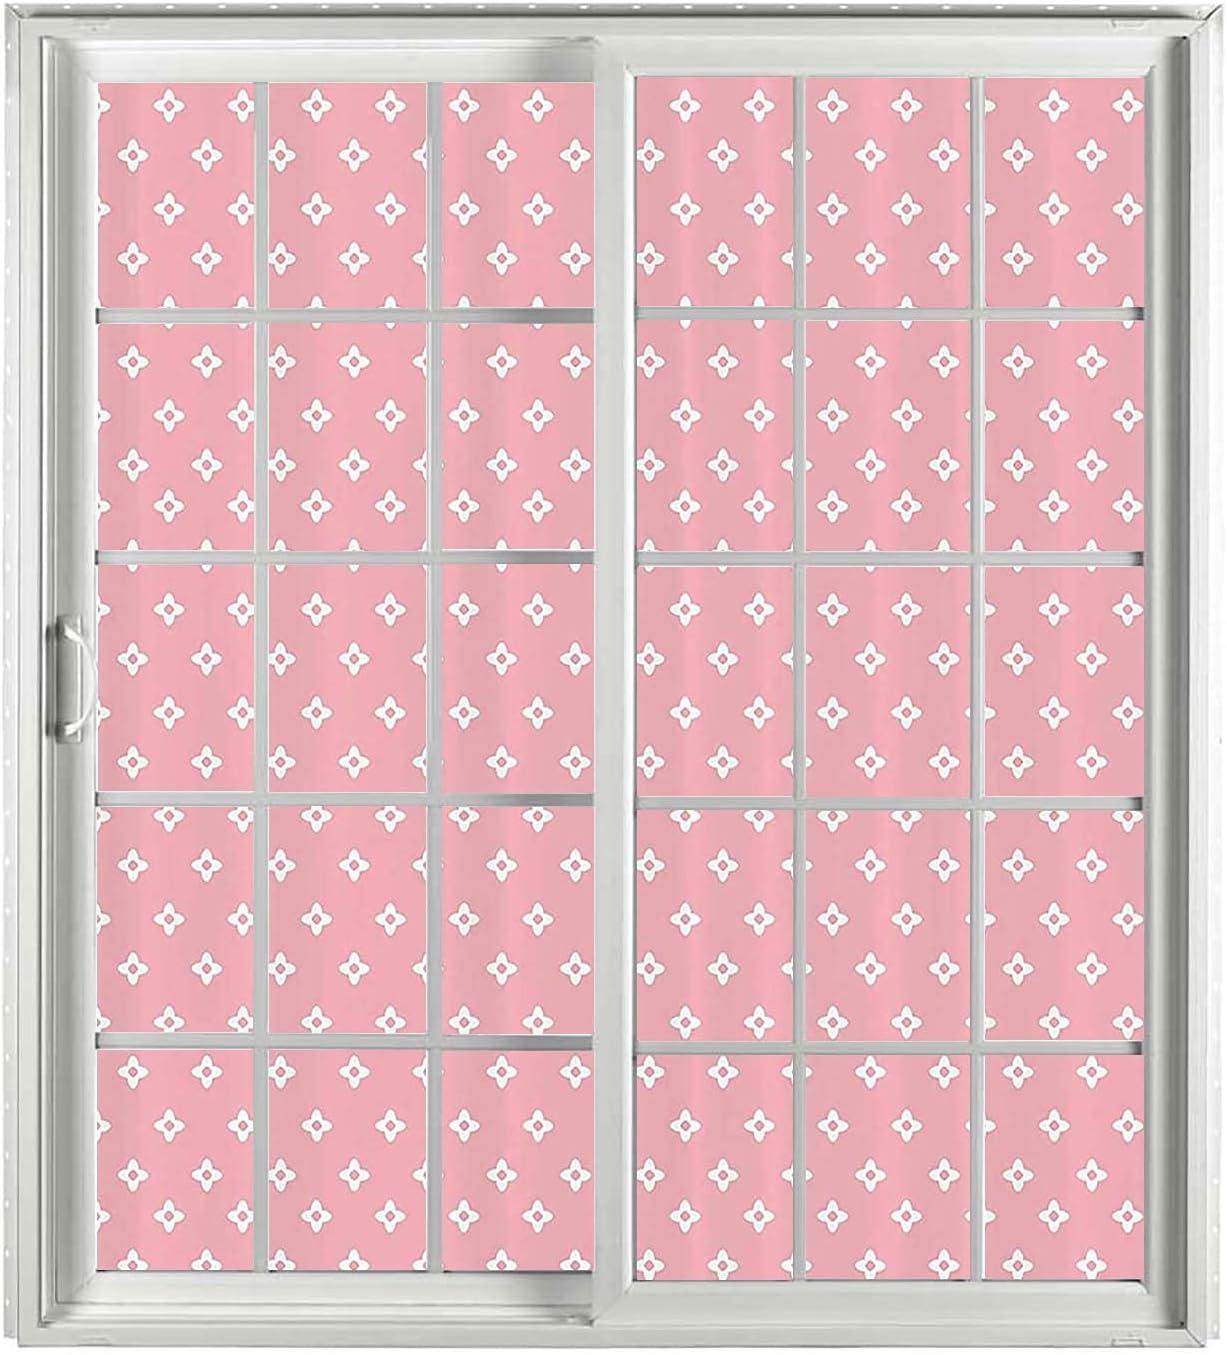 Pink UV Window Film 2 PCS Heat Control White Priv Light Milwaukee Mall Set 70% OFF Outlet